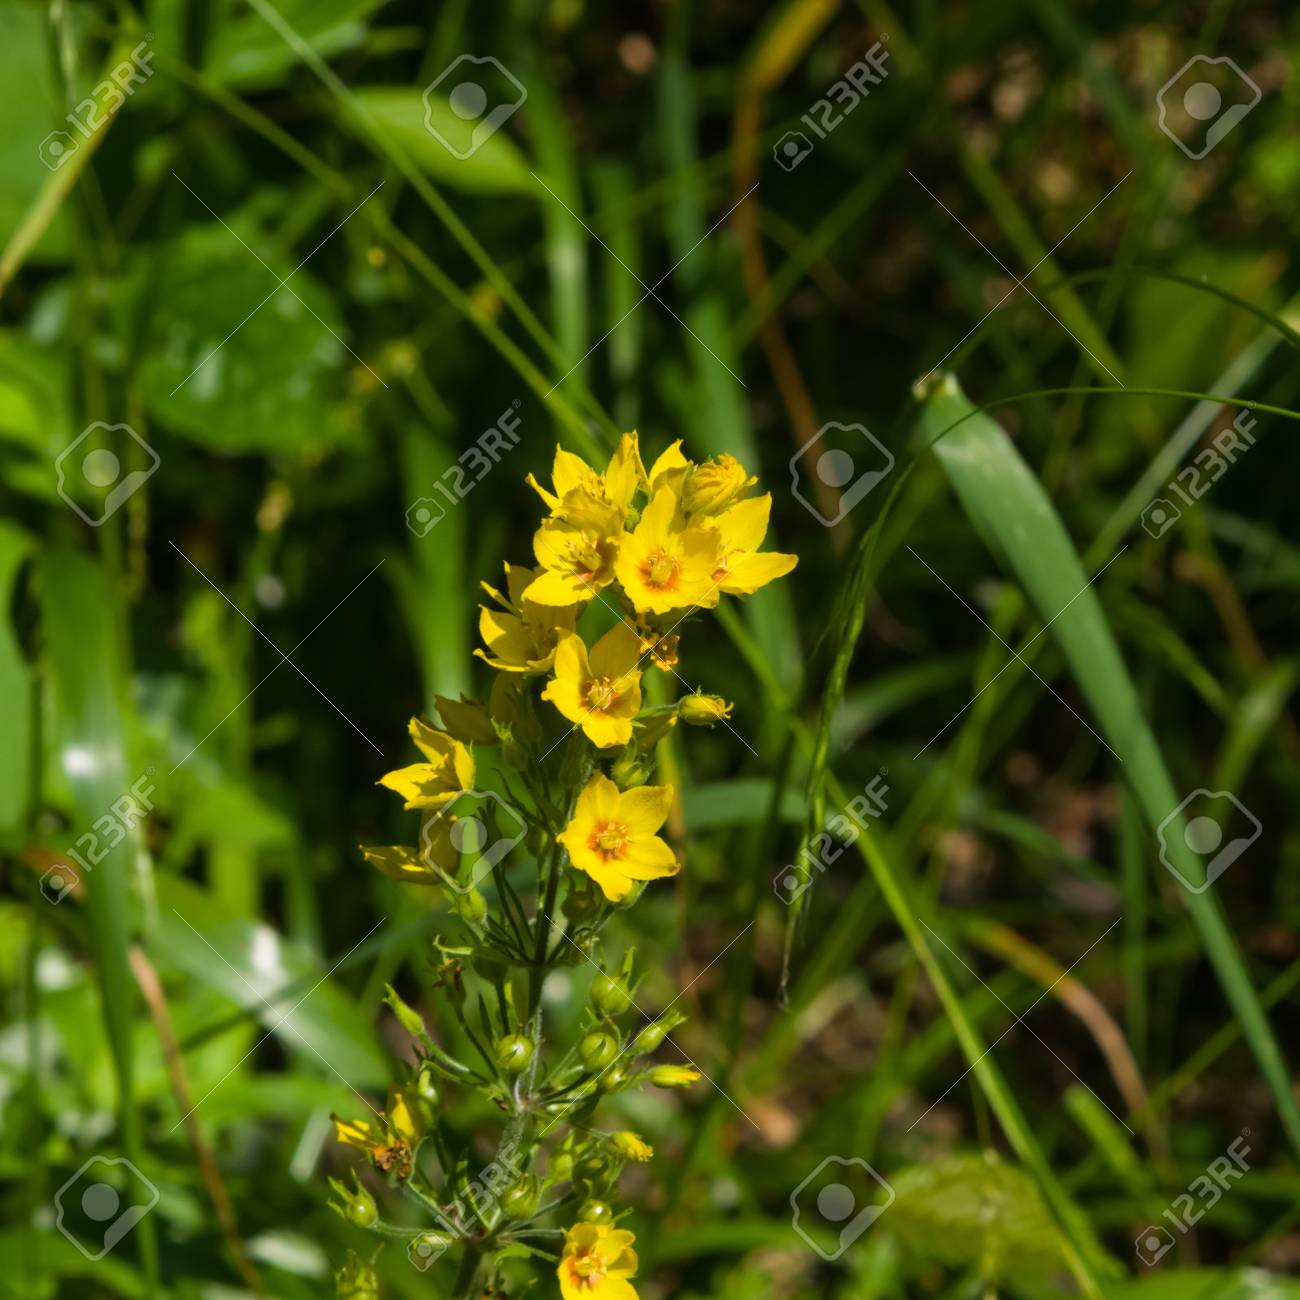 Garden or yellow loosestrife lysimachia vulgaris flowers close up garden or yellow loosestrife lysimachia vulgaris flowers close up selective focus mightylinksfo